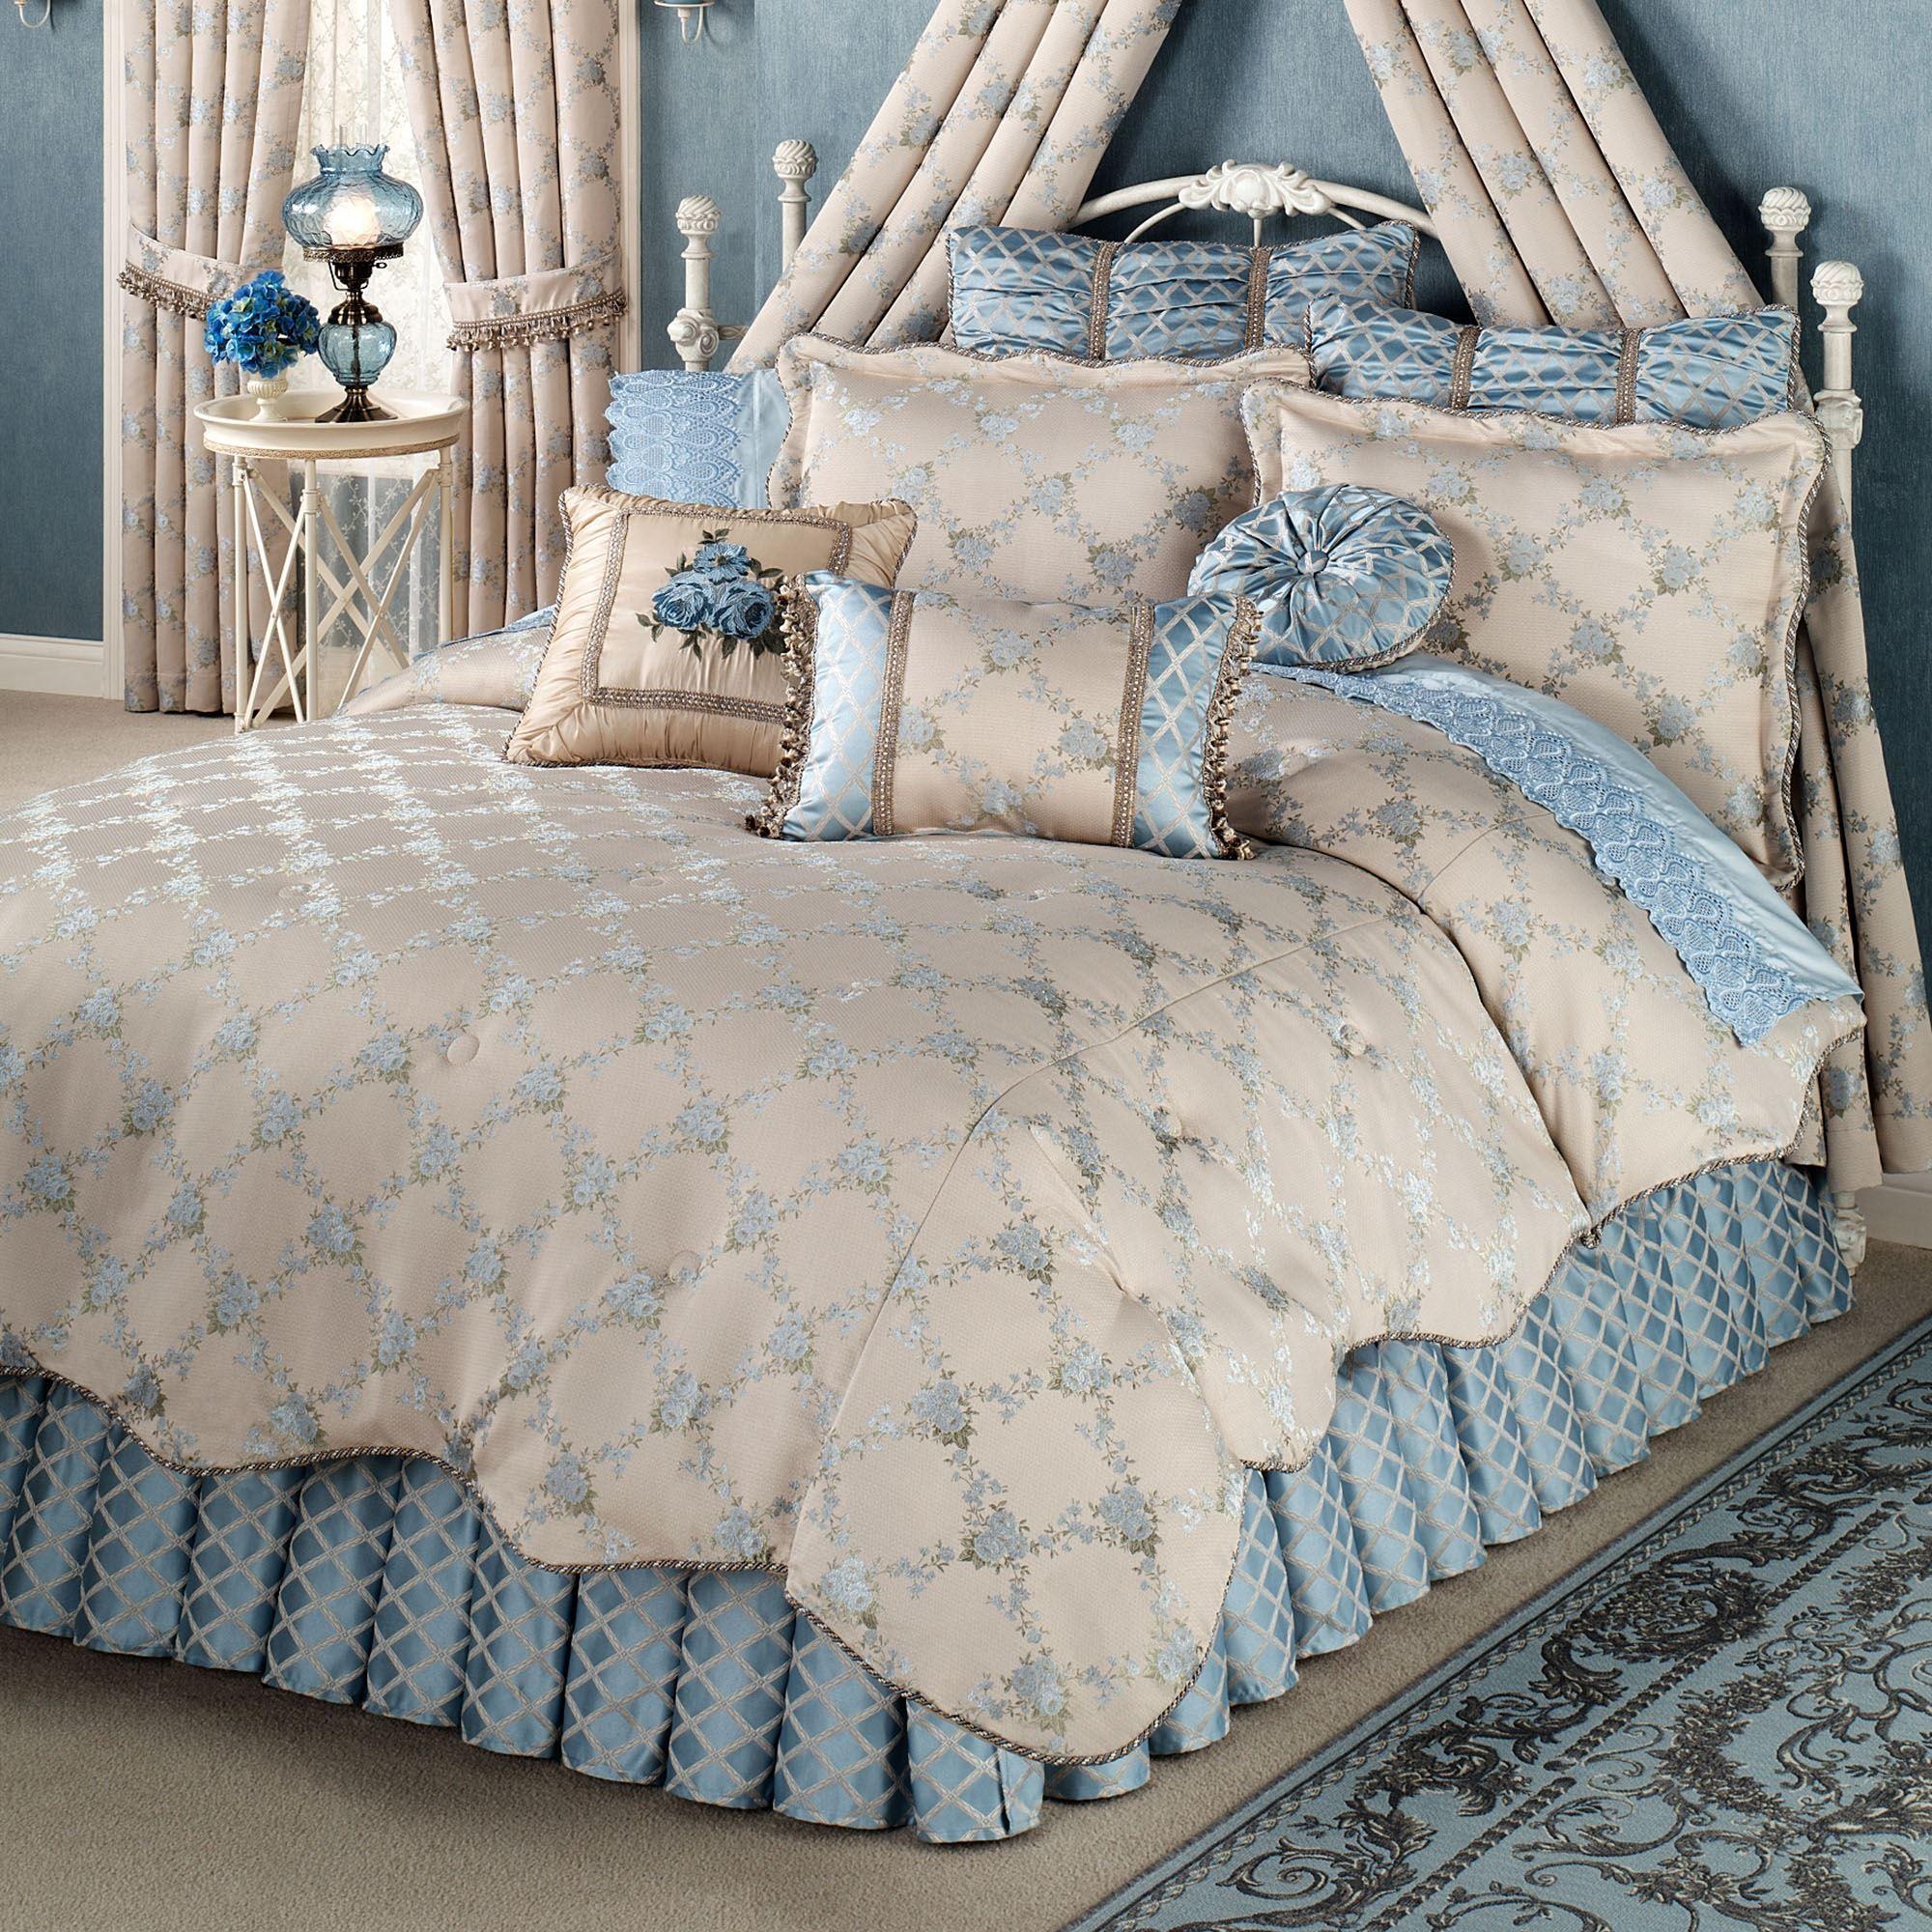 Favorite Blooming Treillage Floral Comforter Bedding JY28